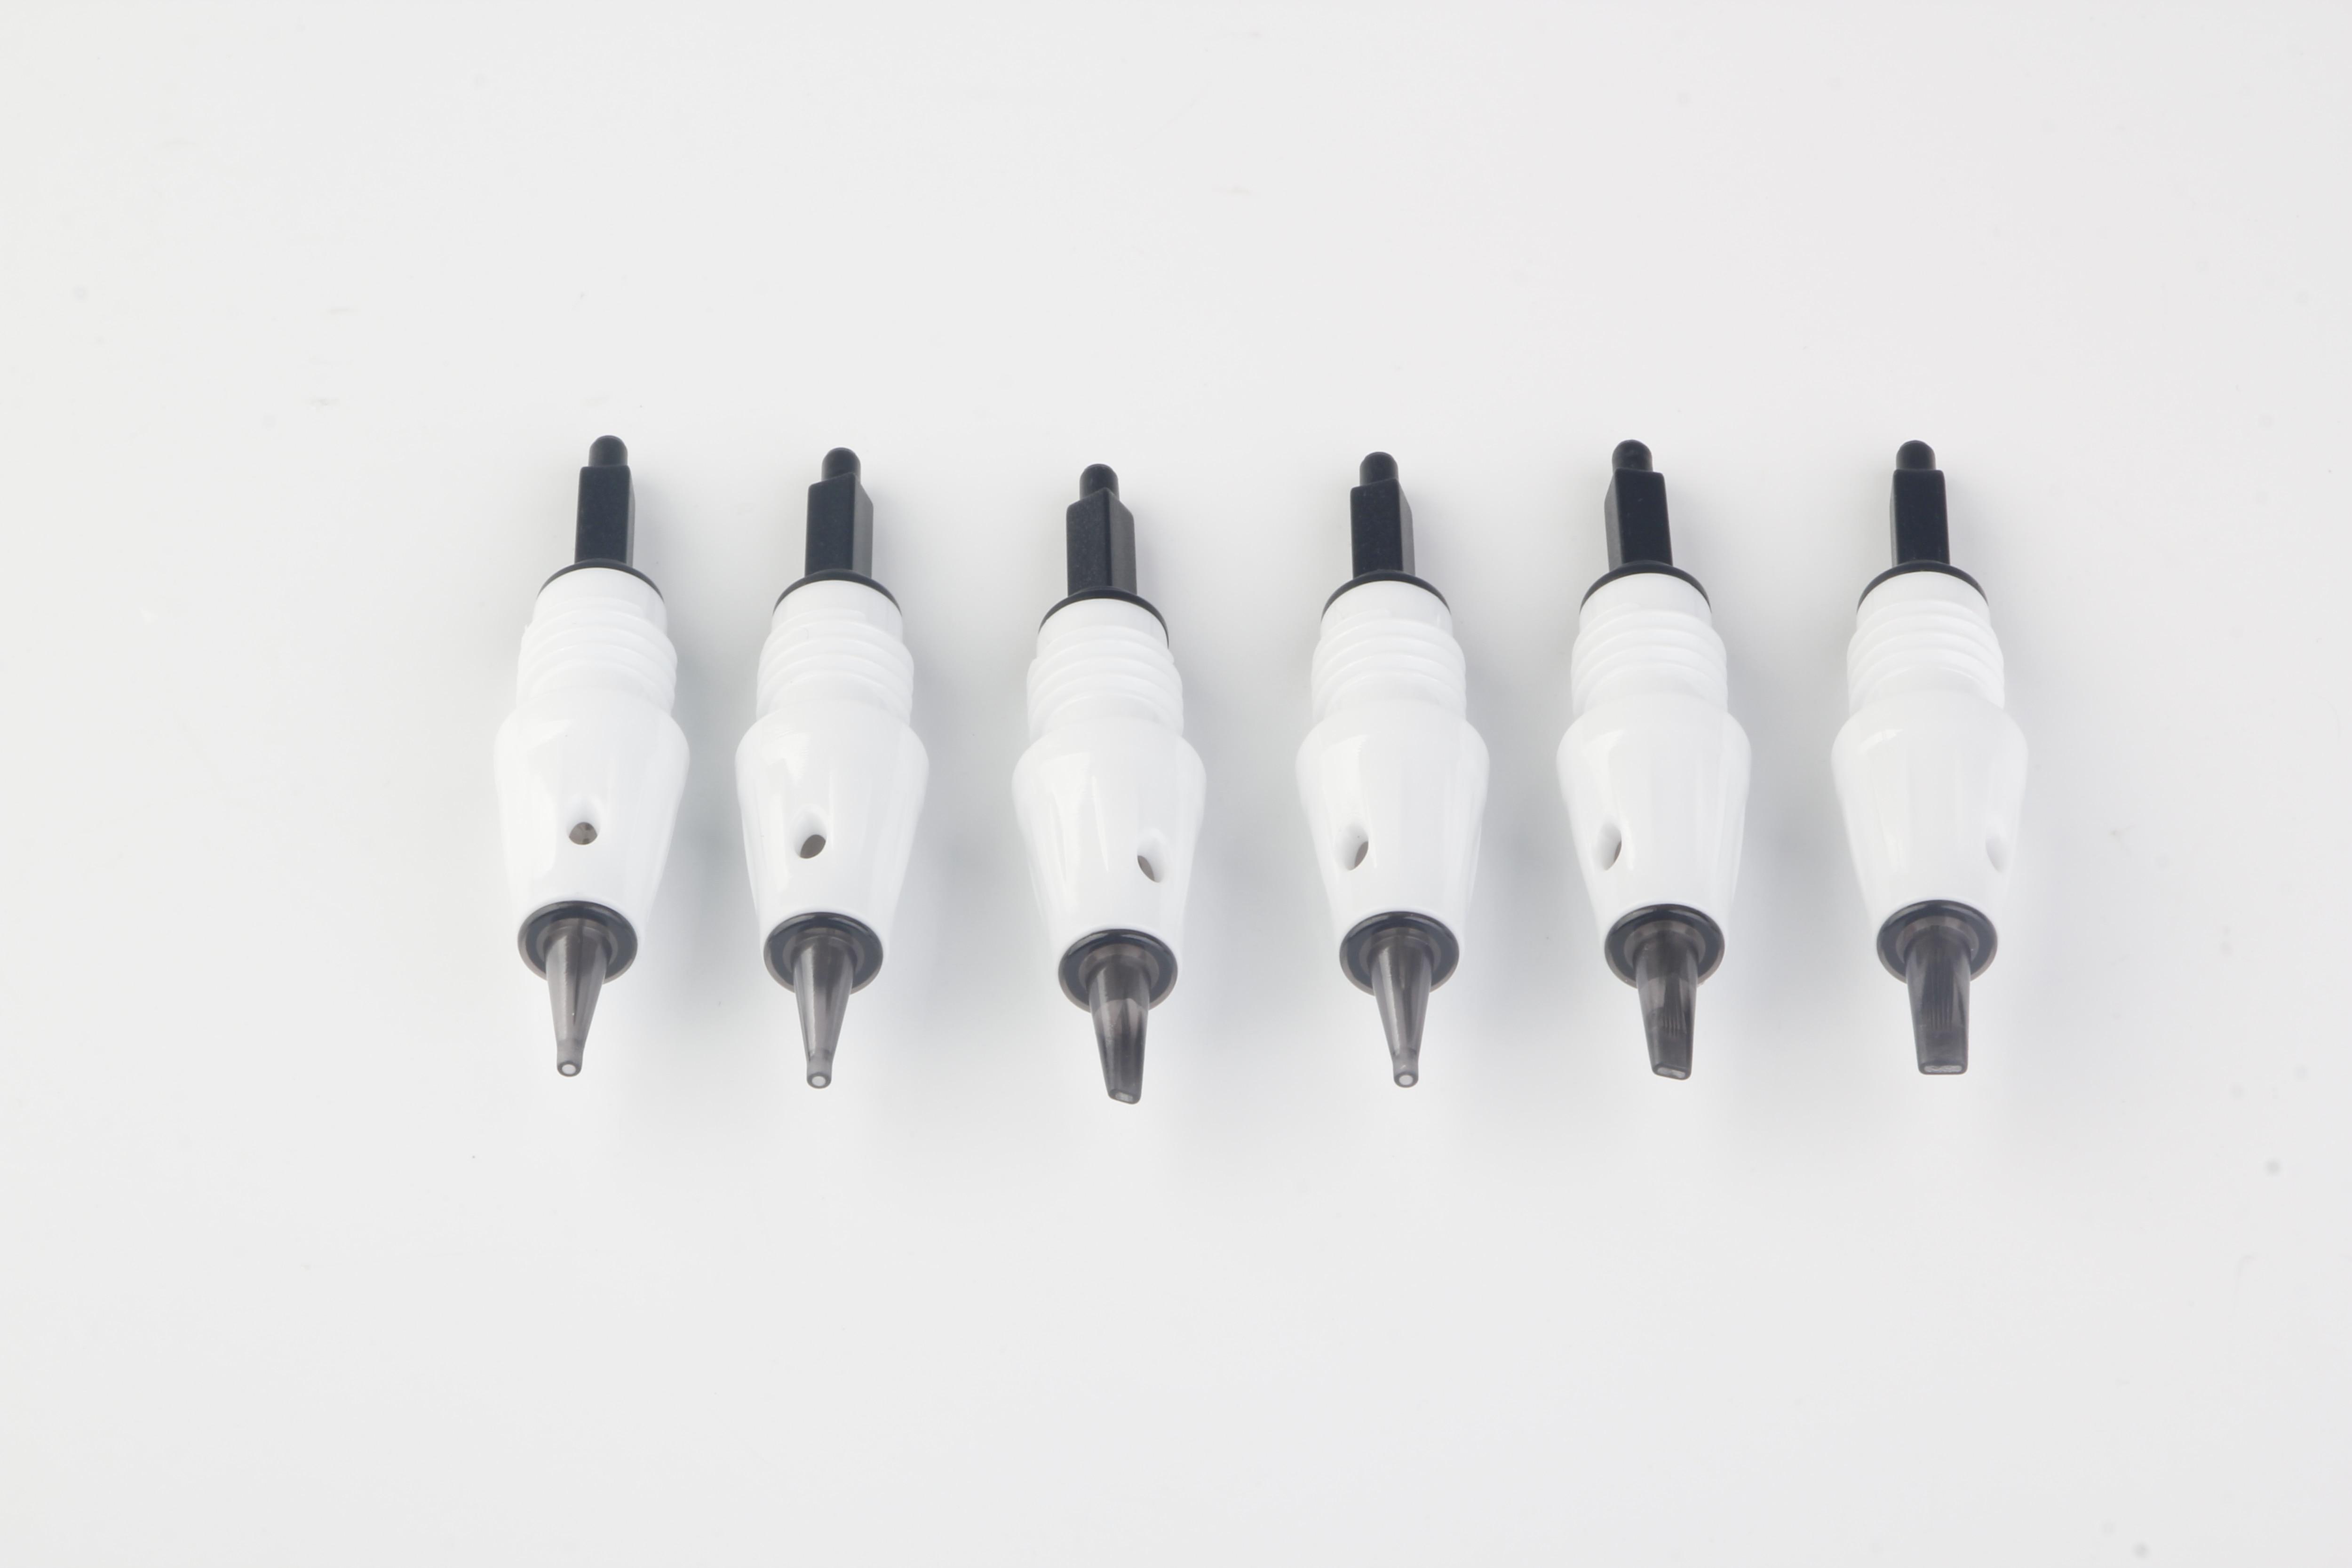 Artmex V11 V10 V9 V8 V6 V3 Needles Permanent Makeup Cosmetics PMU & MTS Needles